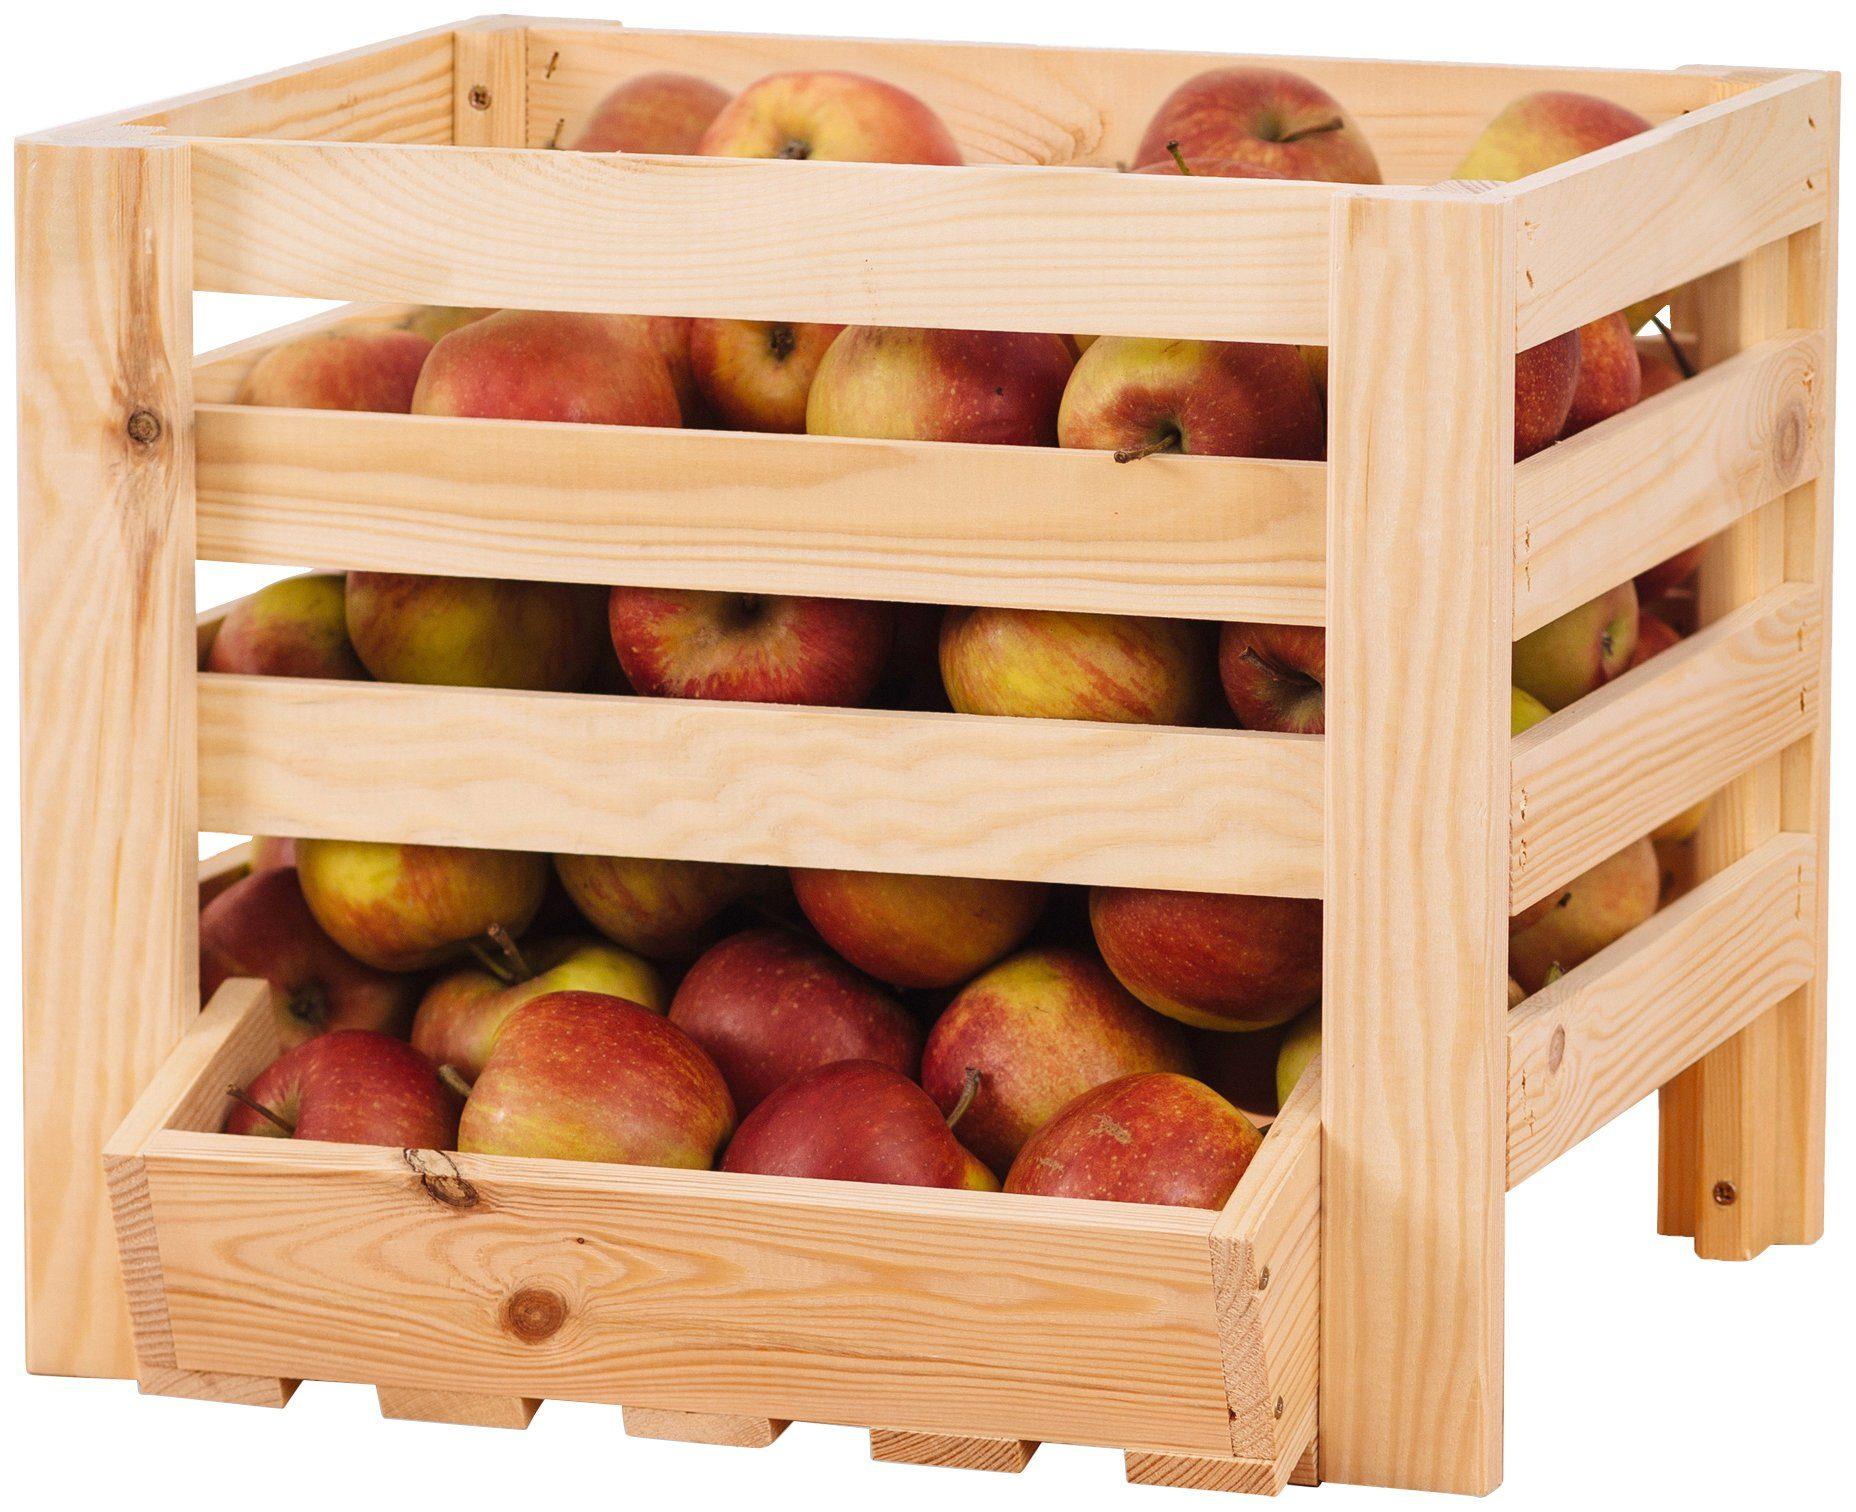 PROMADINO Obst- und Kartoffelkiste , BxTxH: 40x36x33 cm